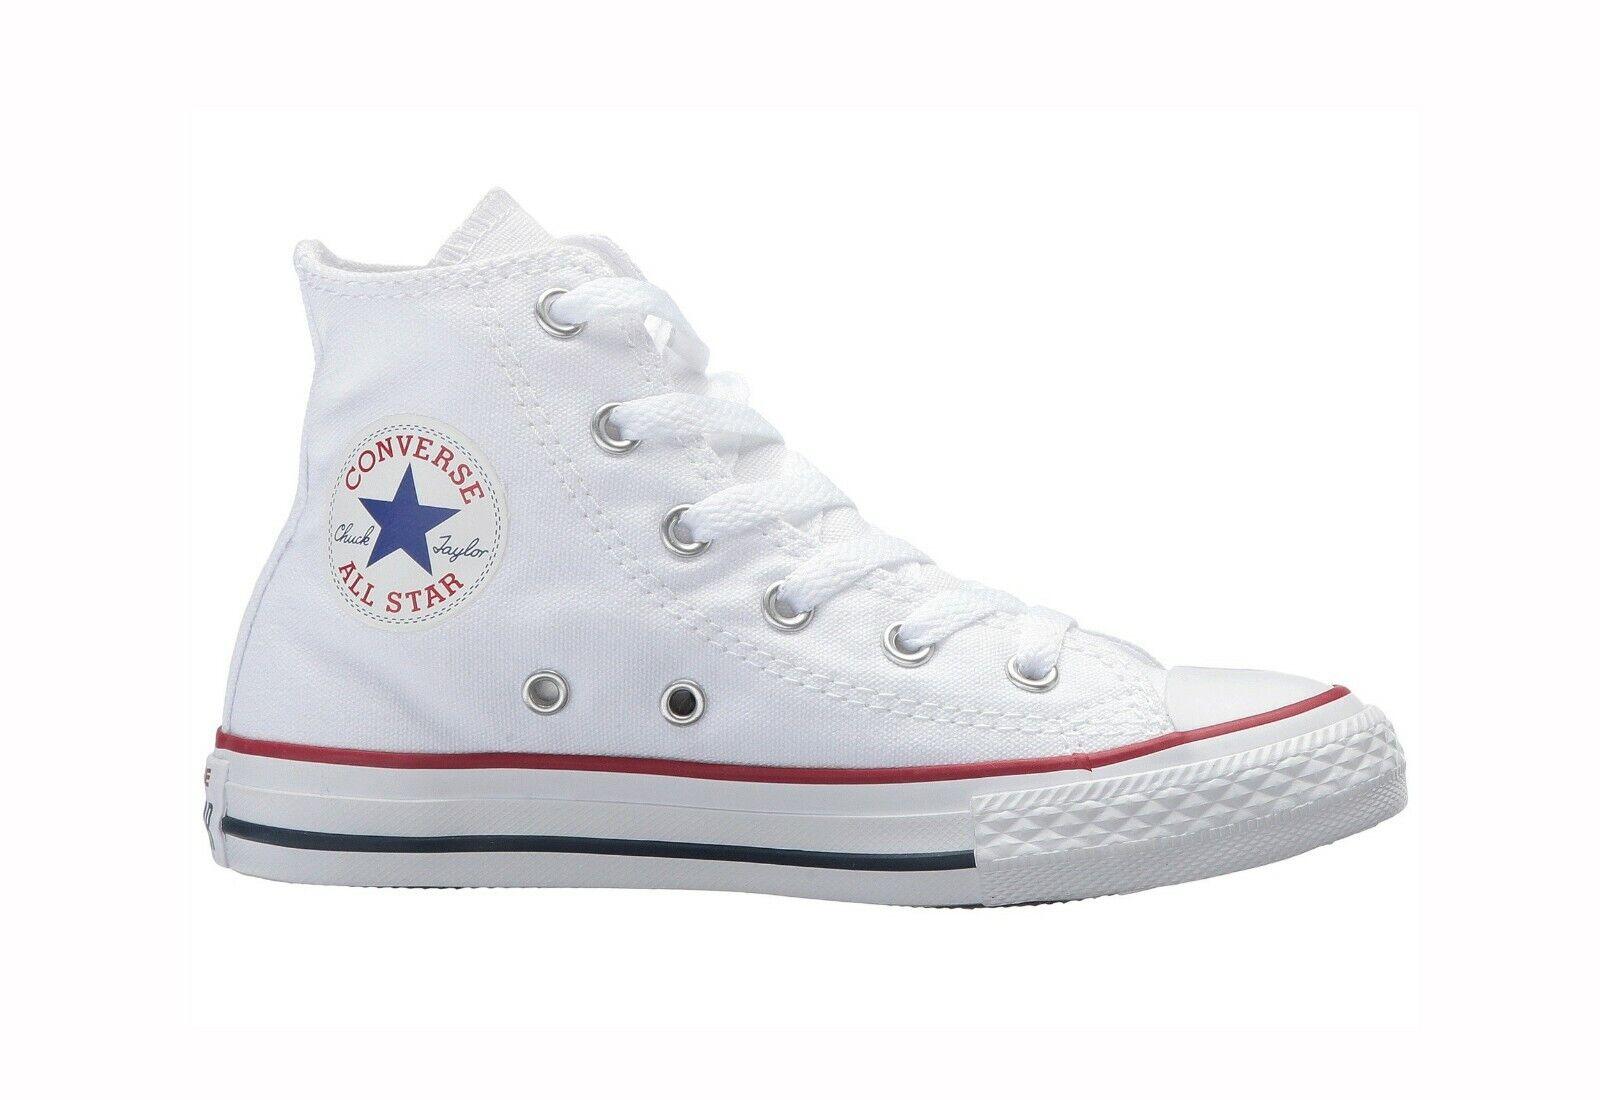 Converse All Star Chucks Children Boys